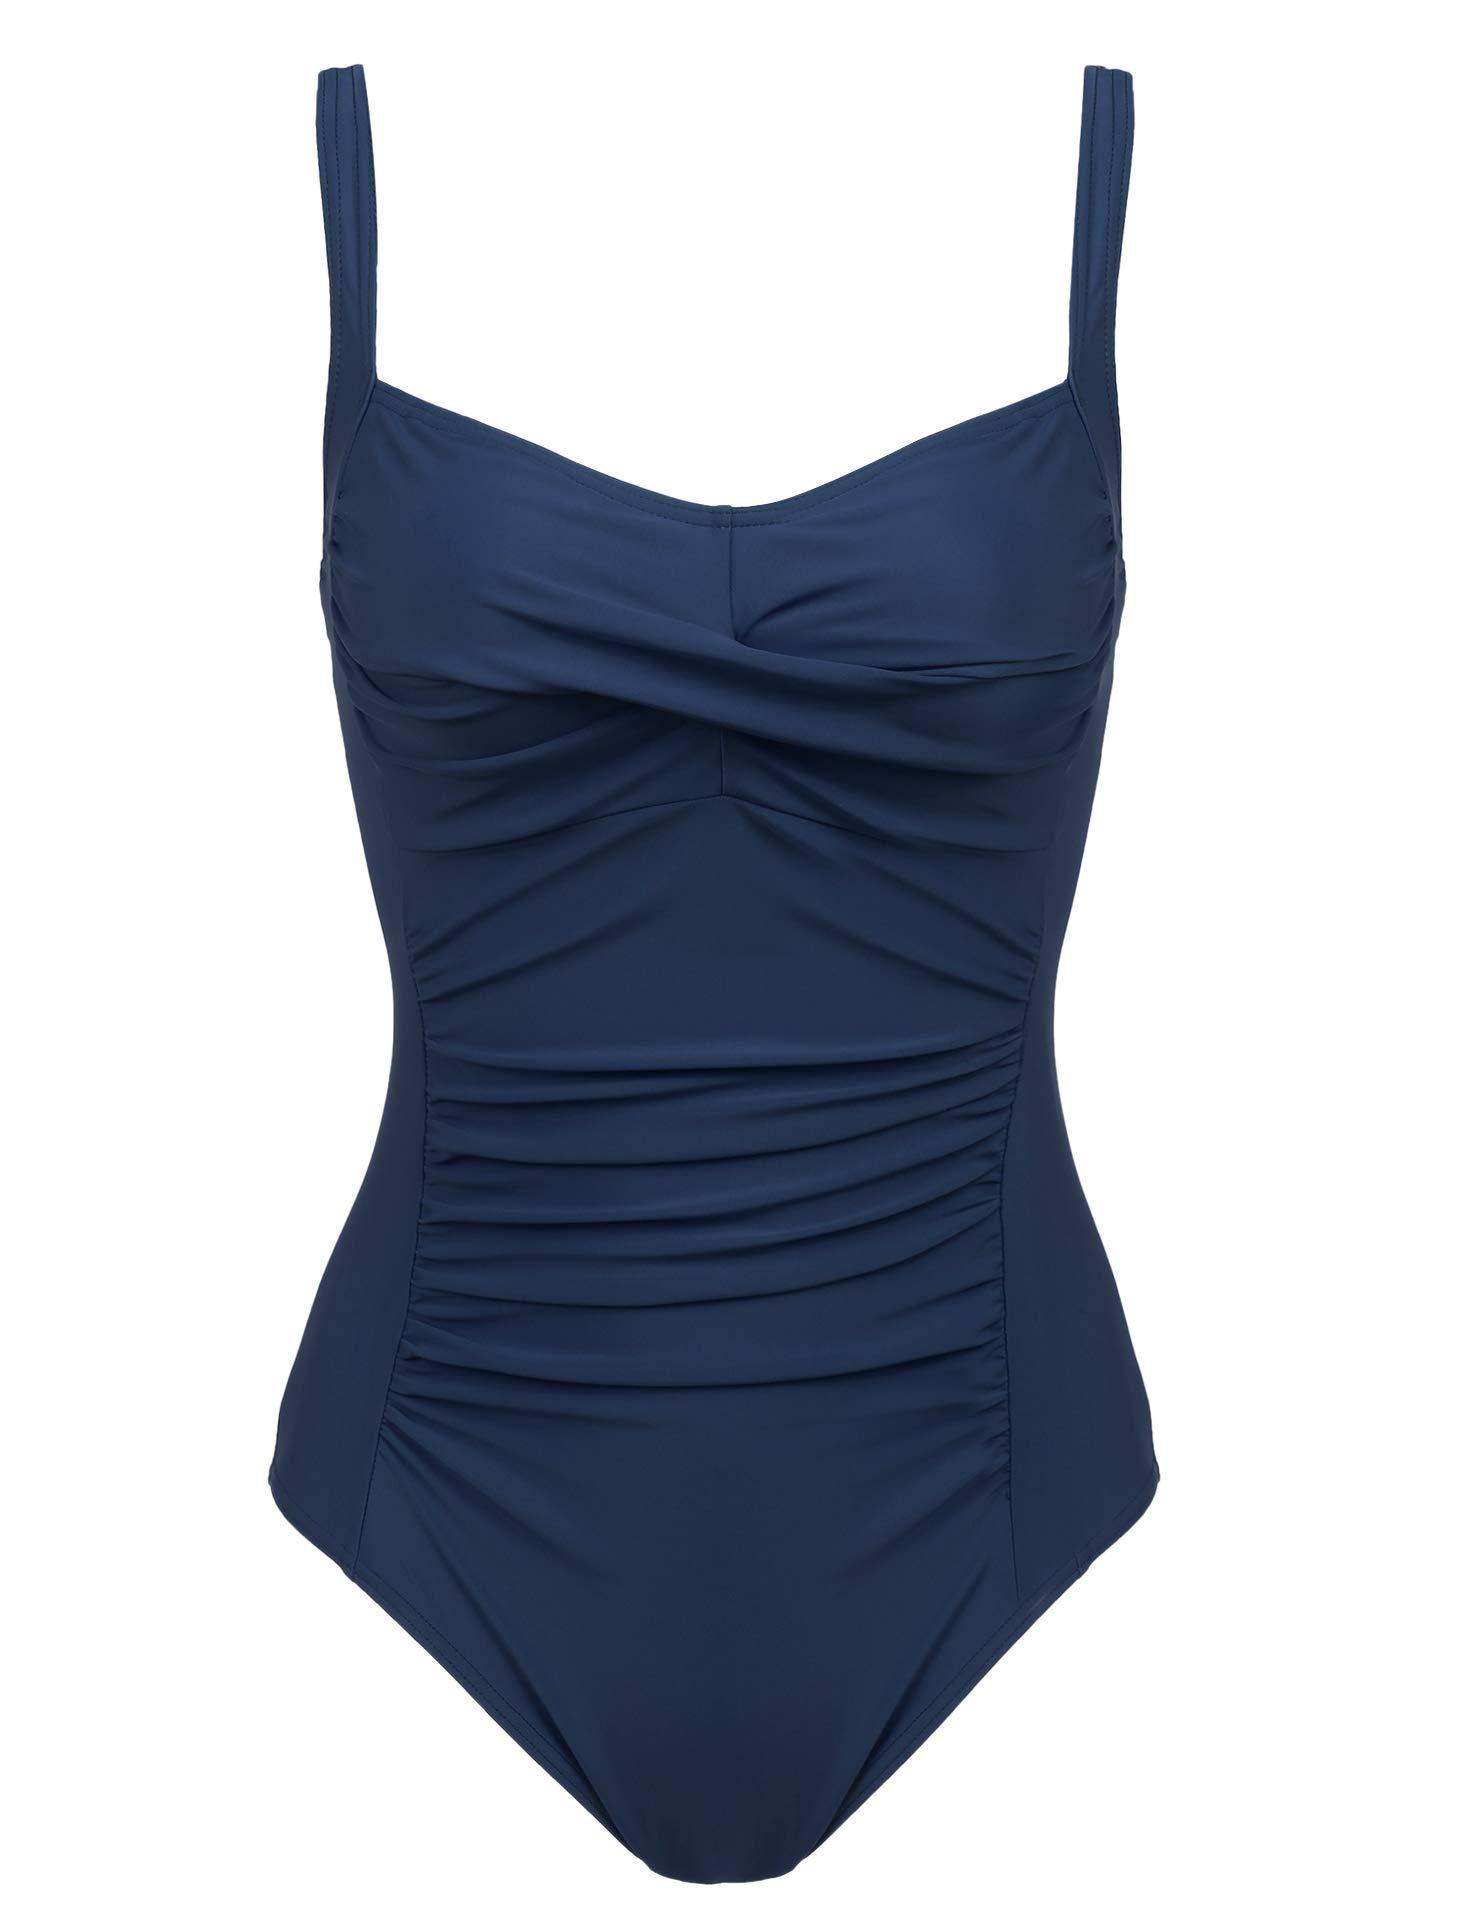 cb8f5dd590e Joyaria Womens Twist Front Ruched One Piece Swimsuit Tummy Control Slimming Bathing  Suit Retro Vintage Swimwear (Navy,Large)